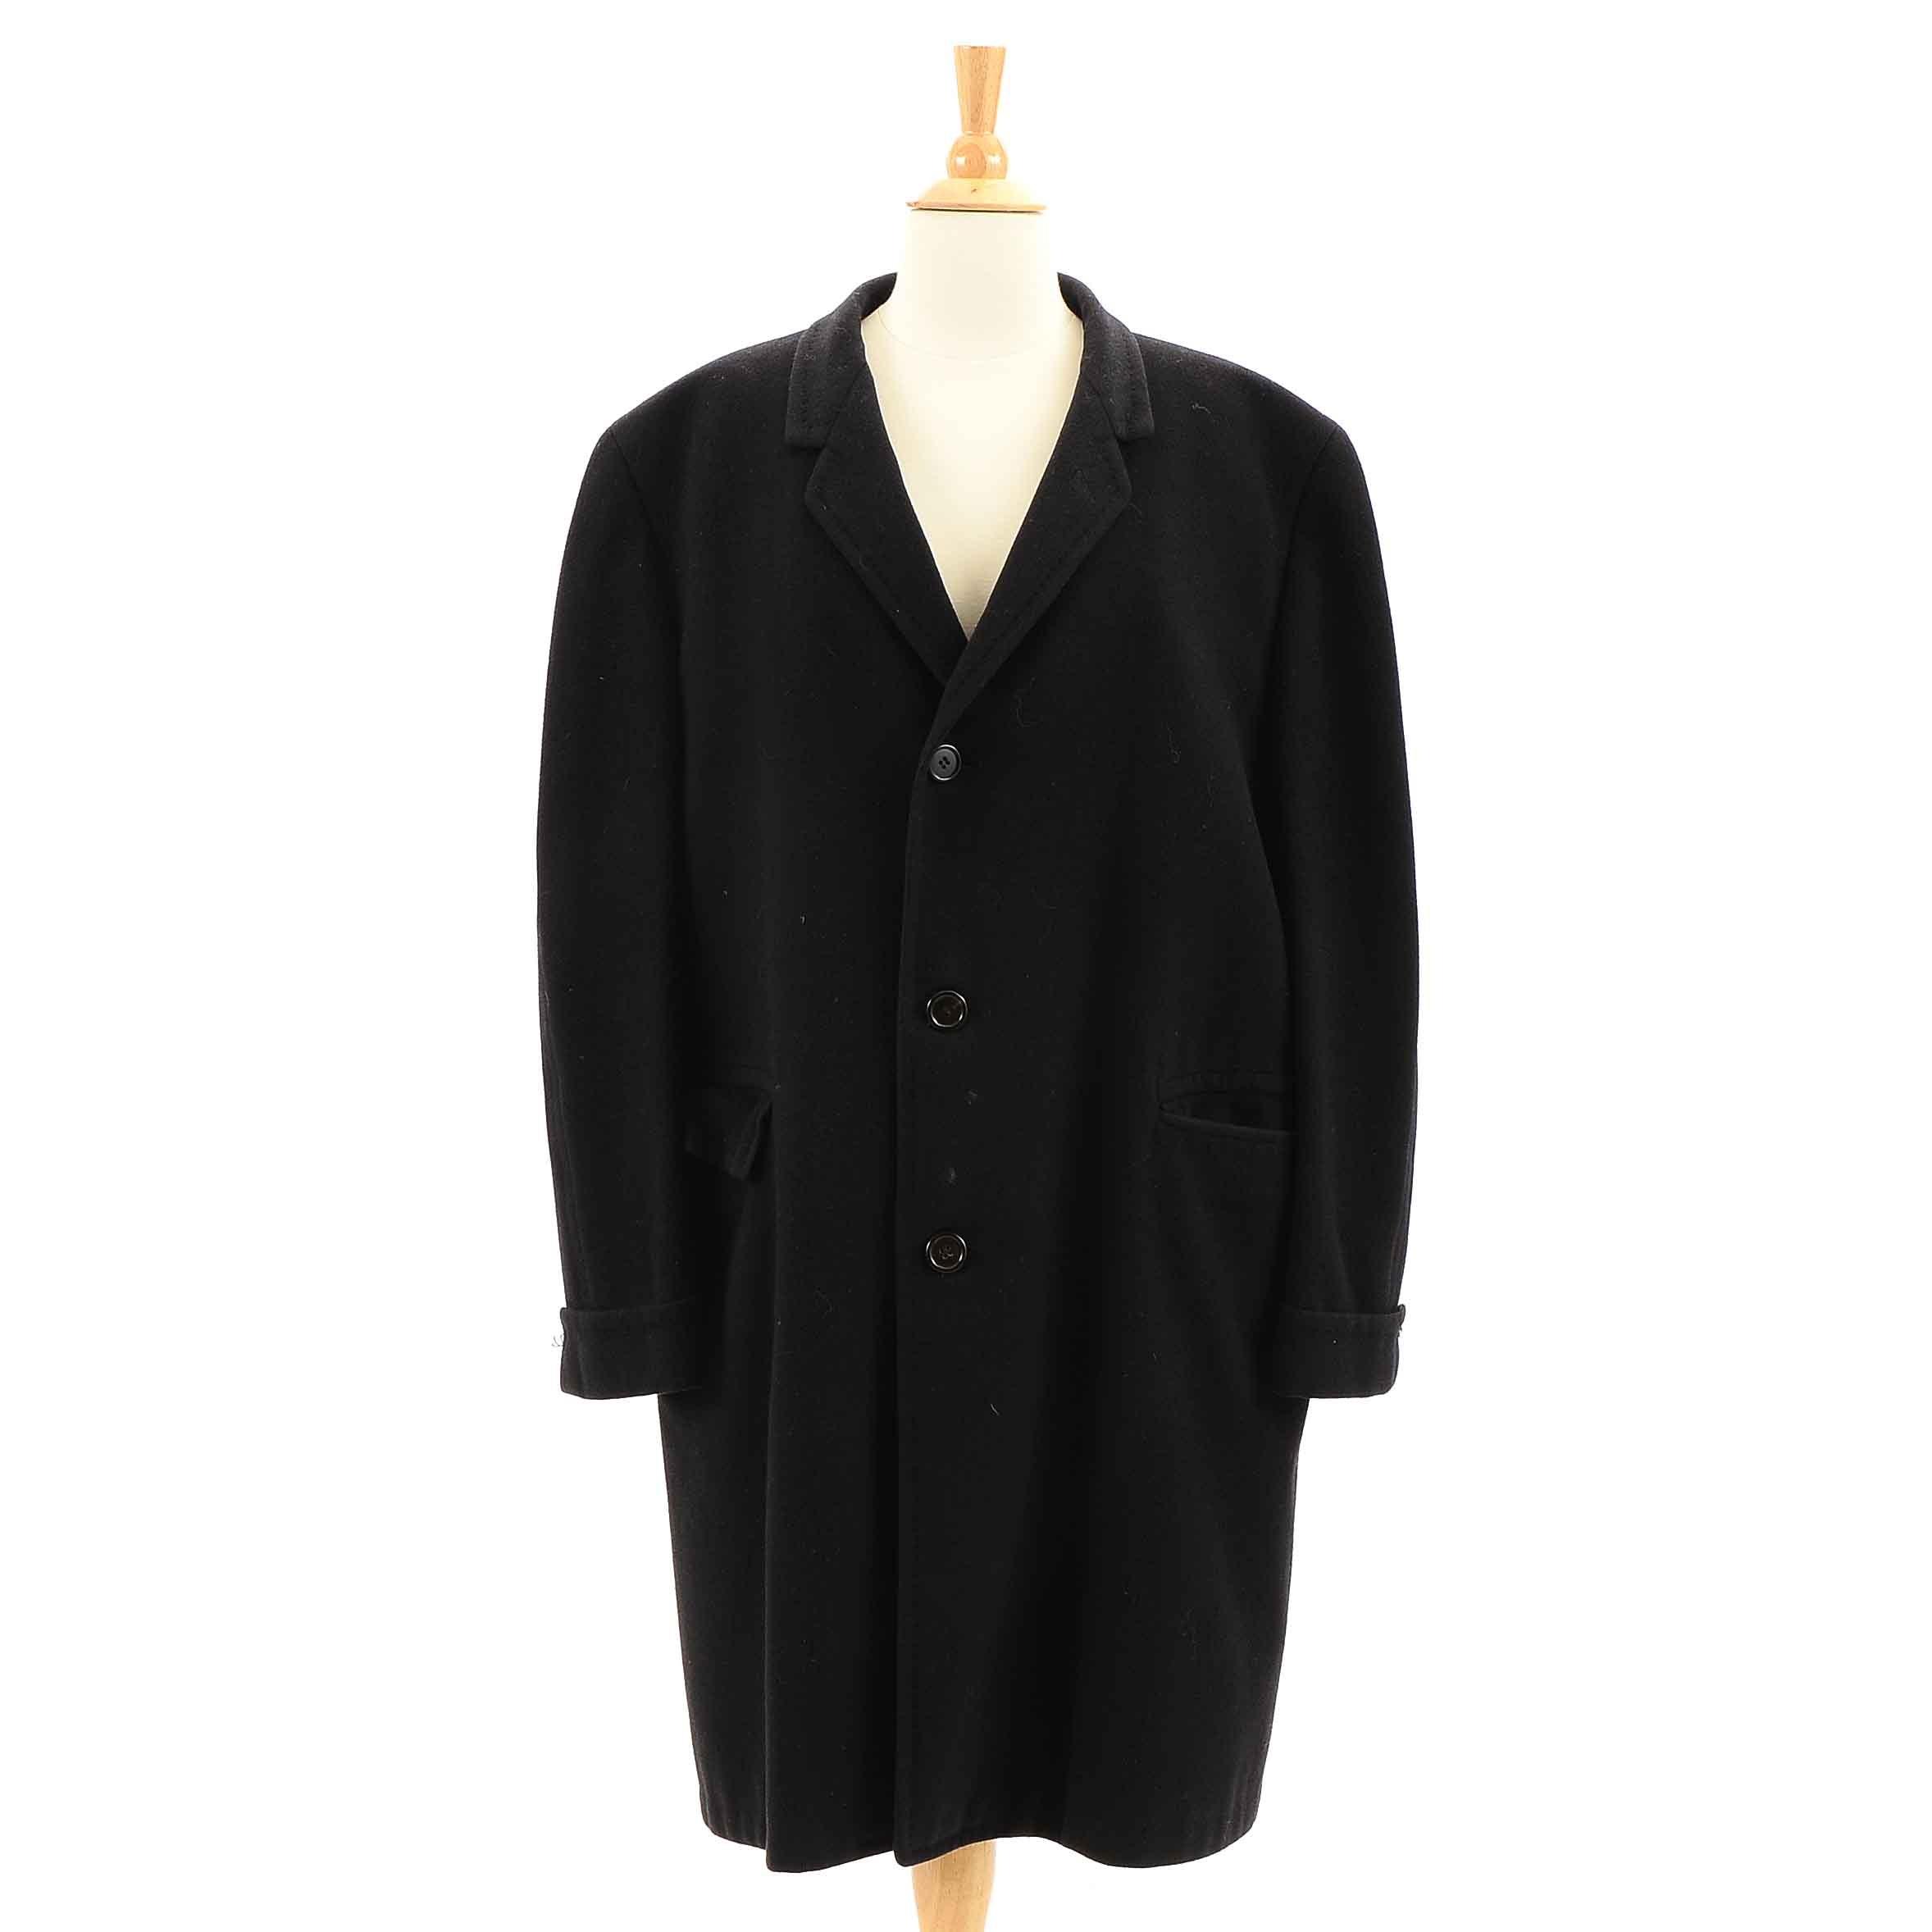 Men's Vintage Cashmere Dress Coat